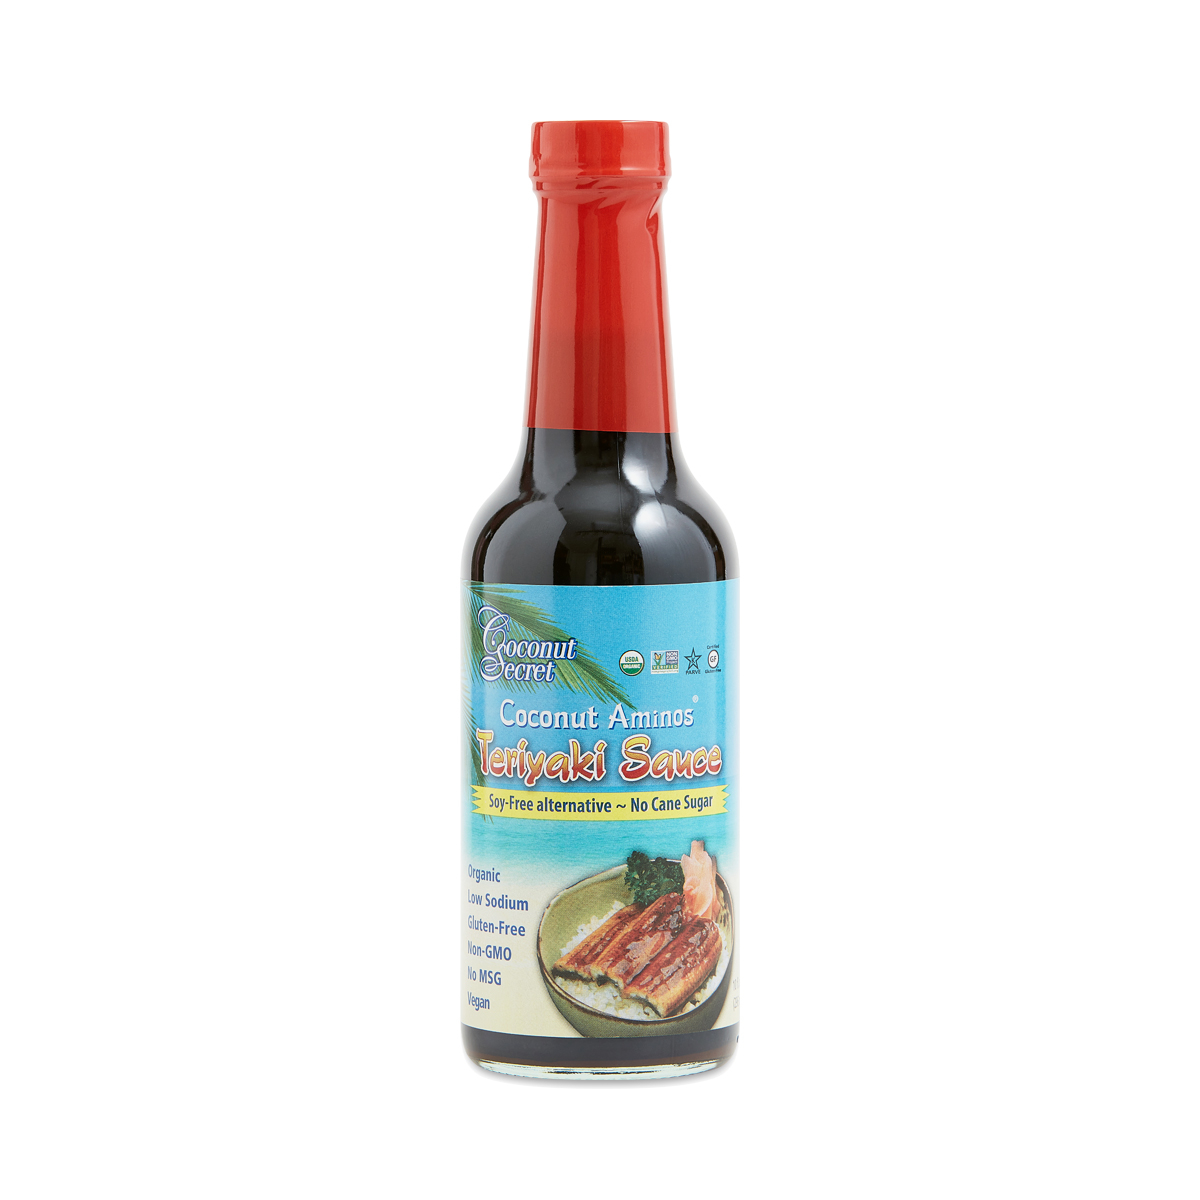 Coconut Secret Coconut Aminos Teriyaki Sauce 10 oz bottle